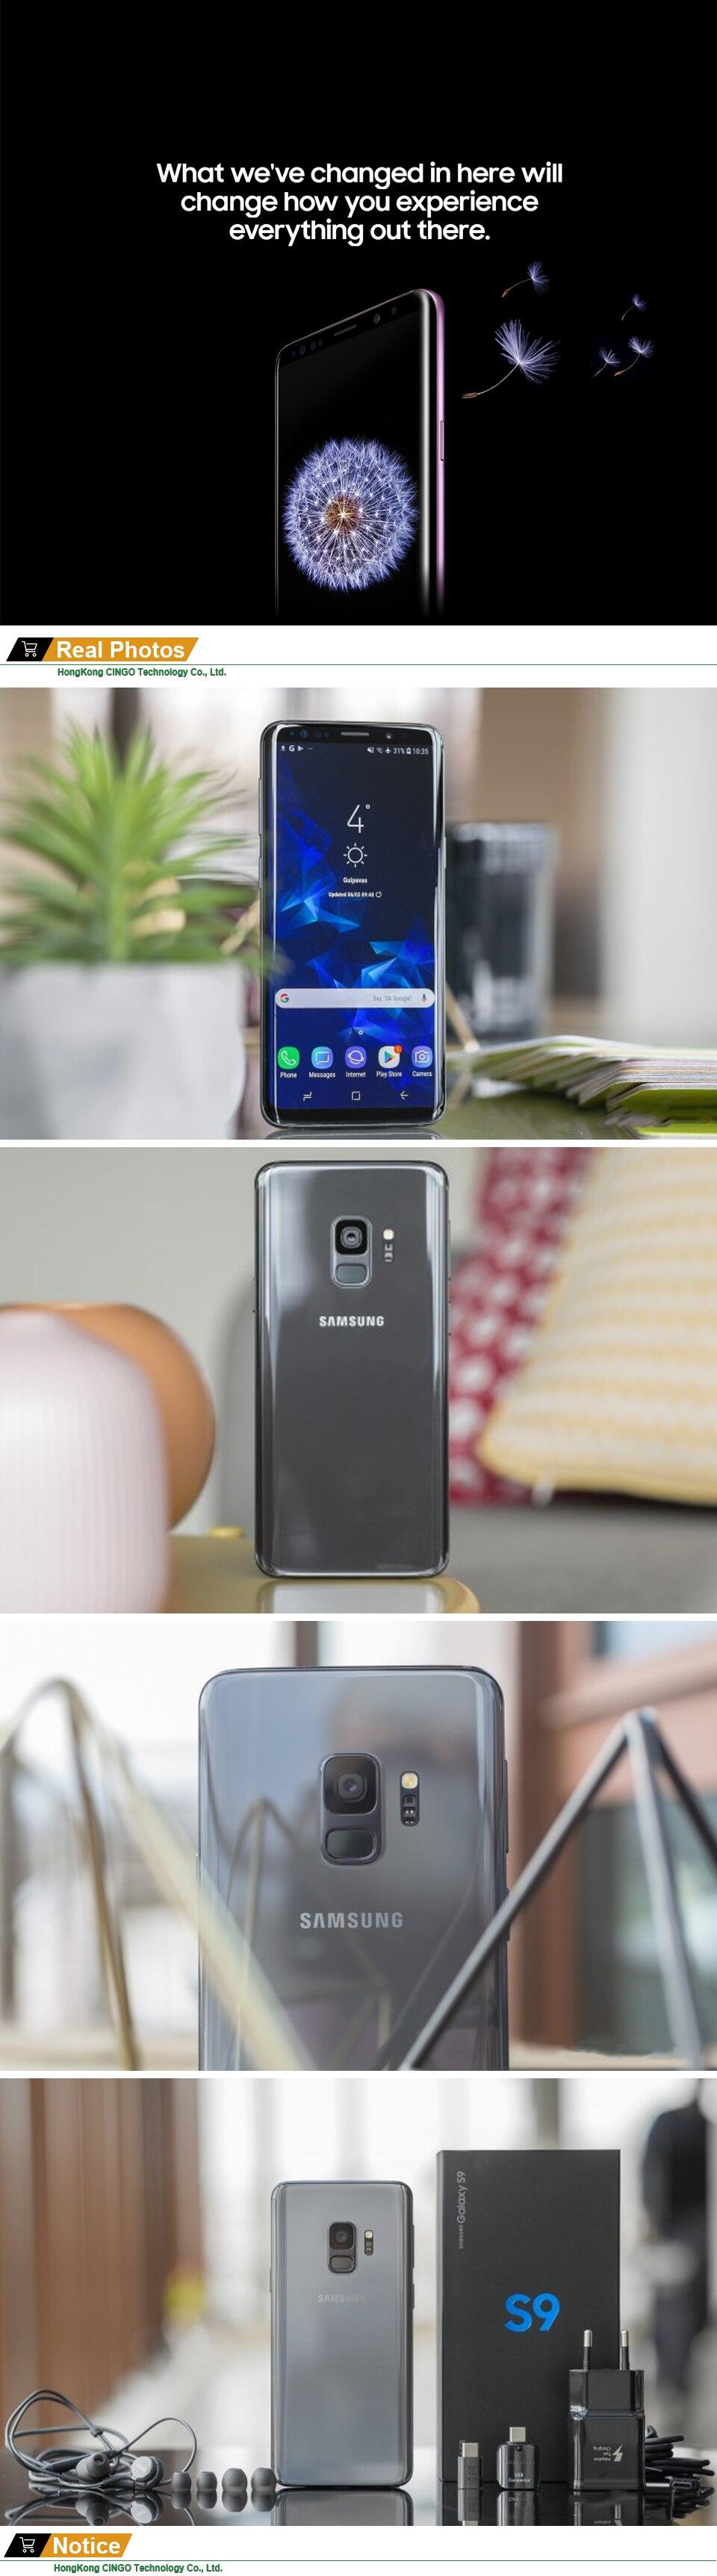 Original Samsung Galaxy S9 5.8″ Inch 4G LTE Dual Sim Mobile phone 18.5:9 screen 64GB 12MP 3000mAh Qualcomm Octa-core Smartphone